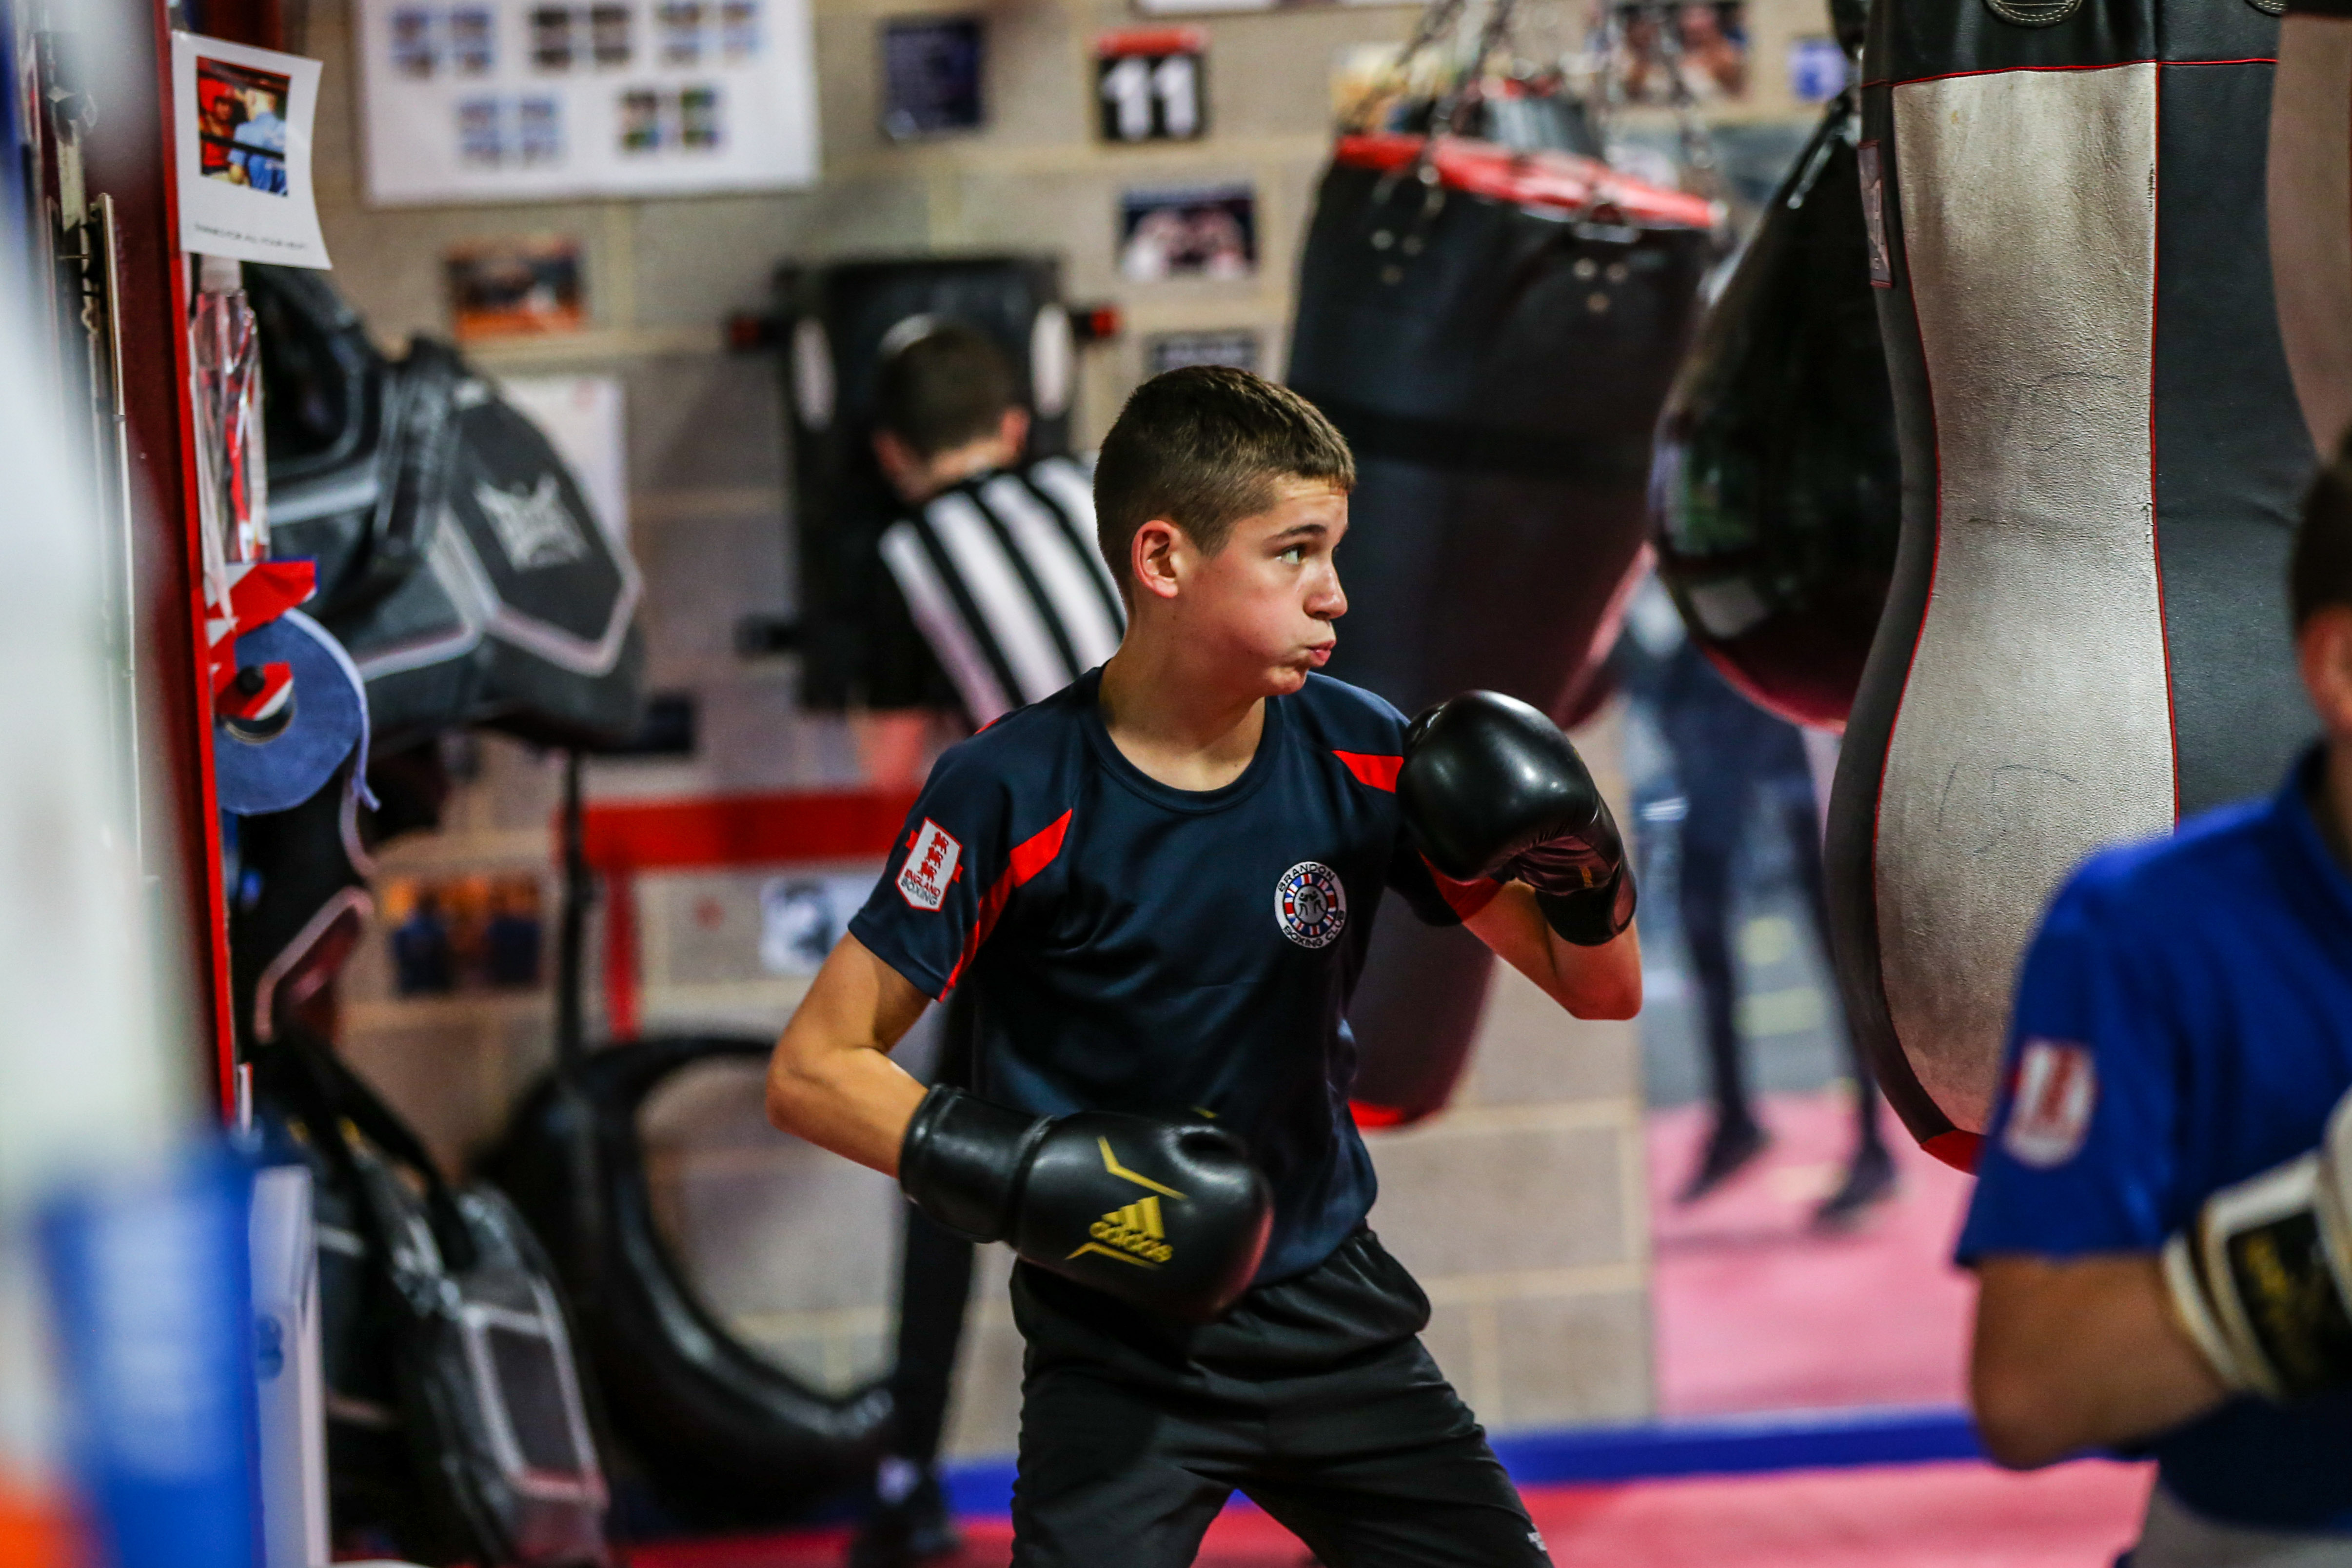 A young boy prepares to strike a boxing bag